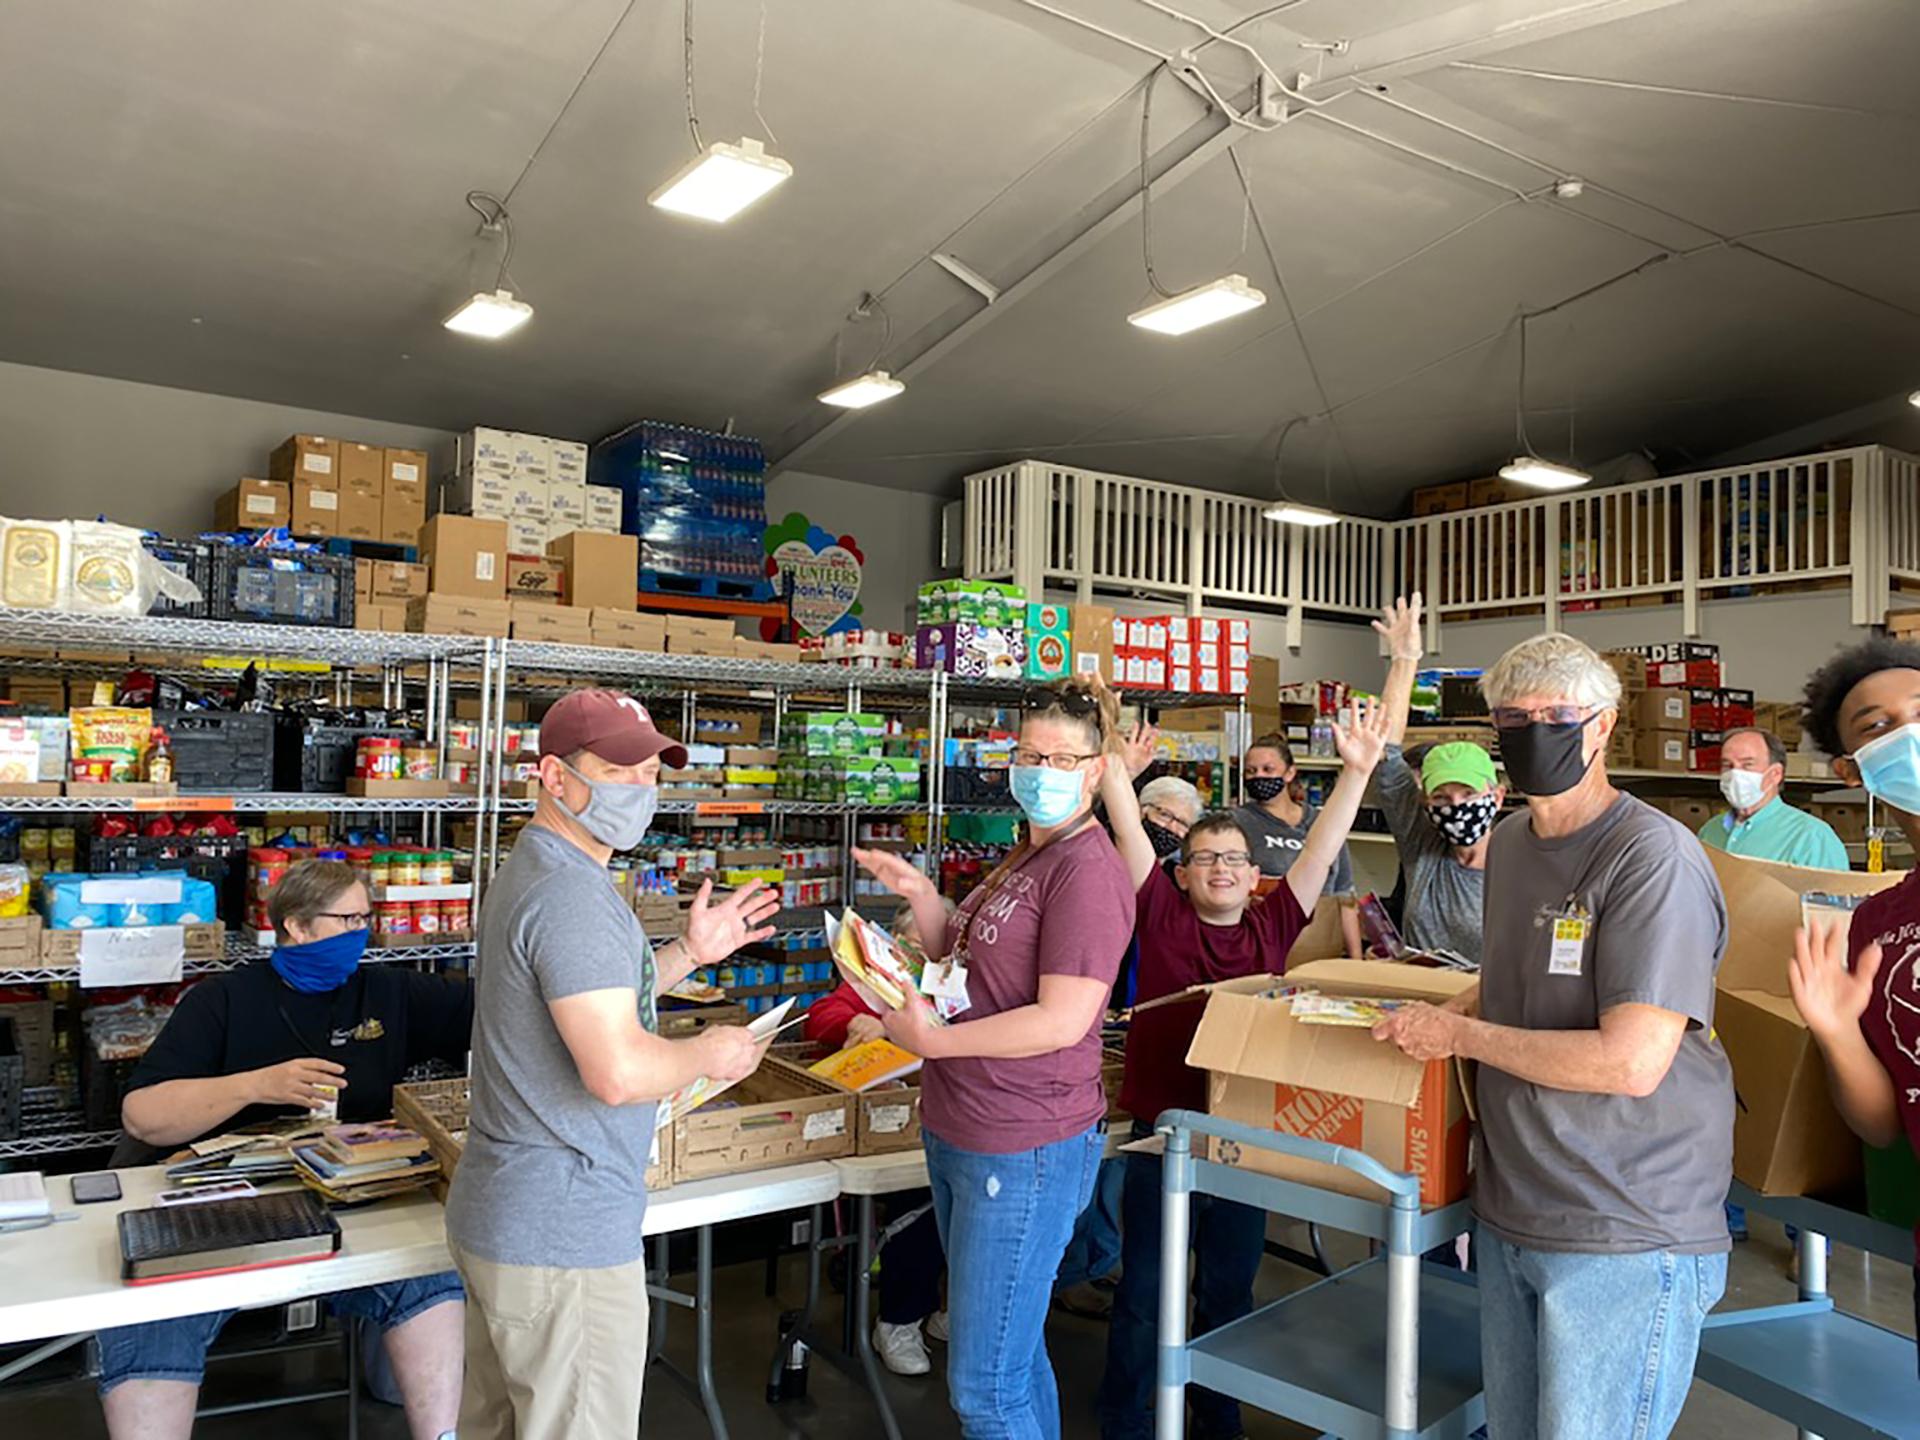 Wyatt Elementary School Donates Books at Amazing Grace Food Pantry